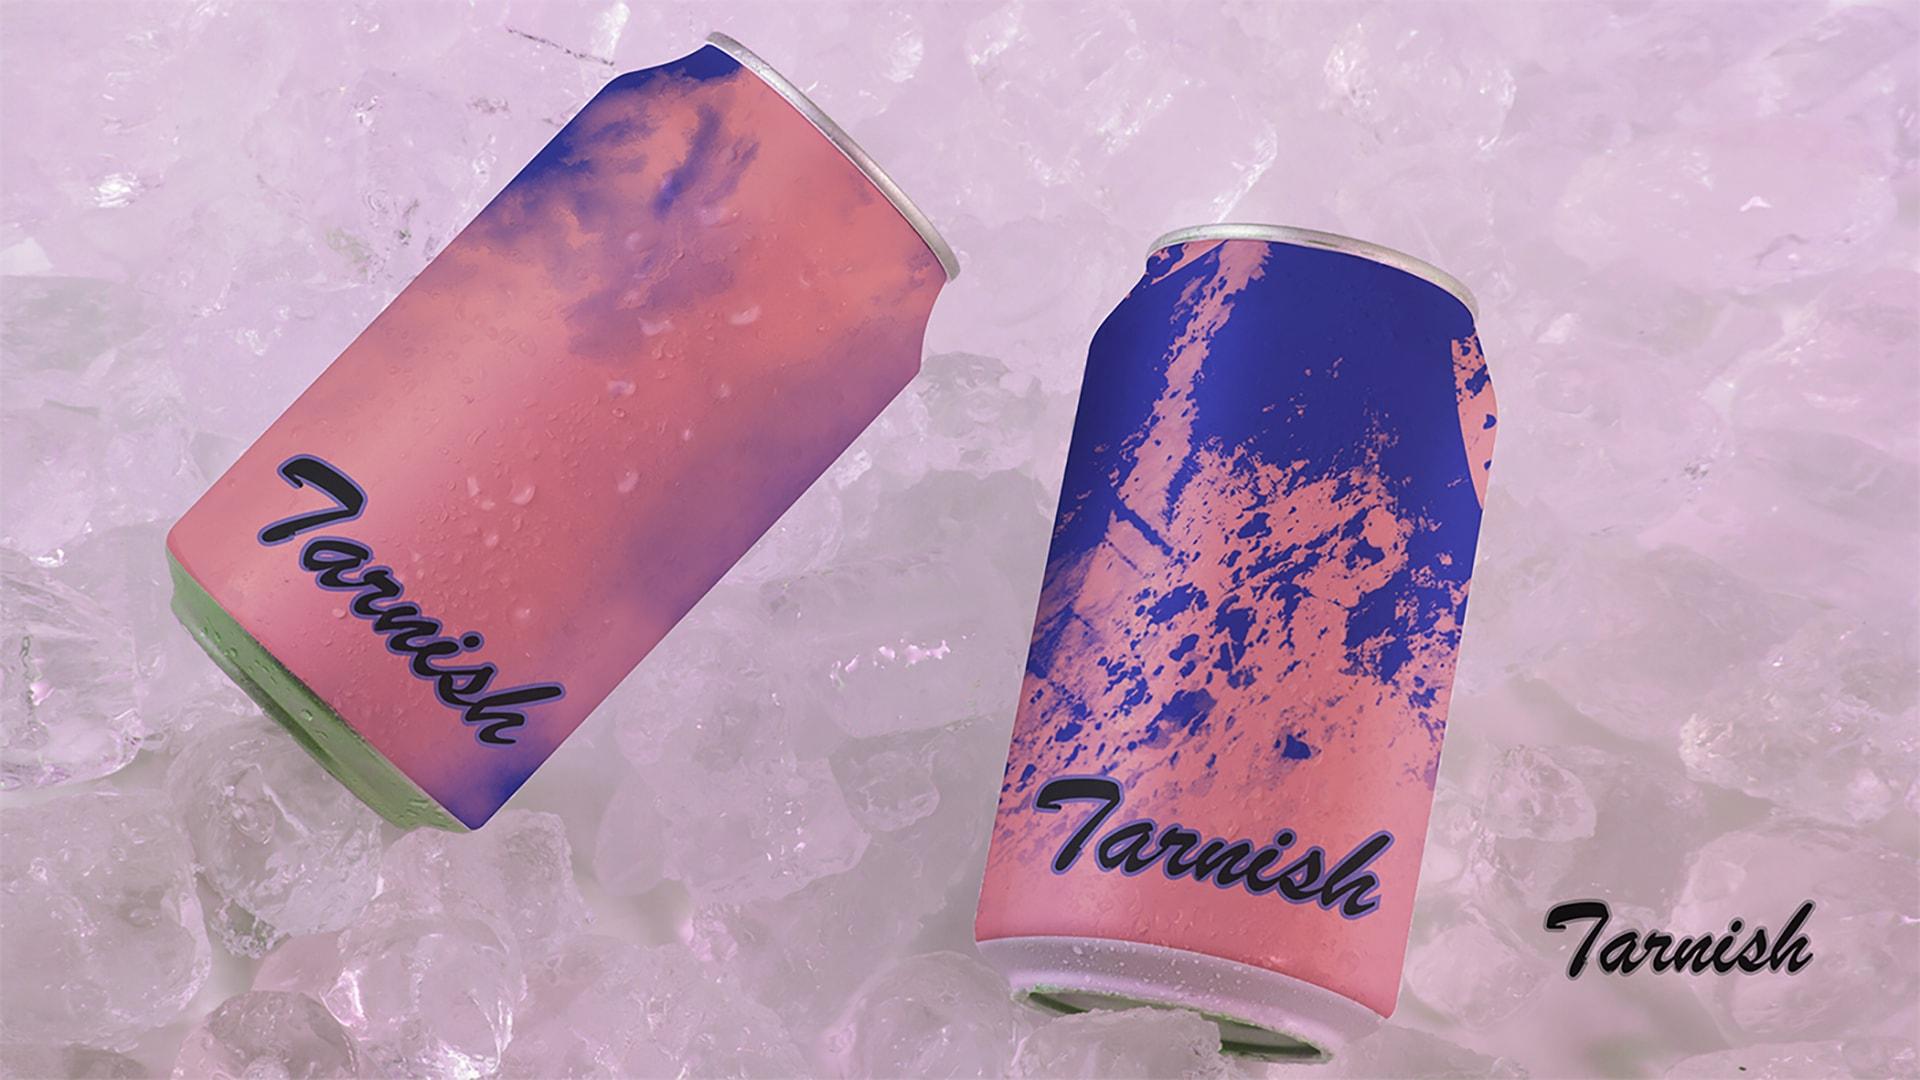 Tarnish冰啤樱桃口味包装设计效果图